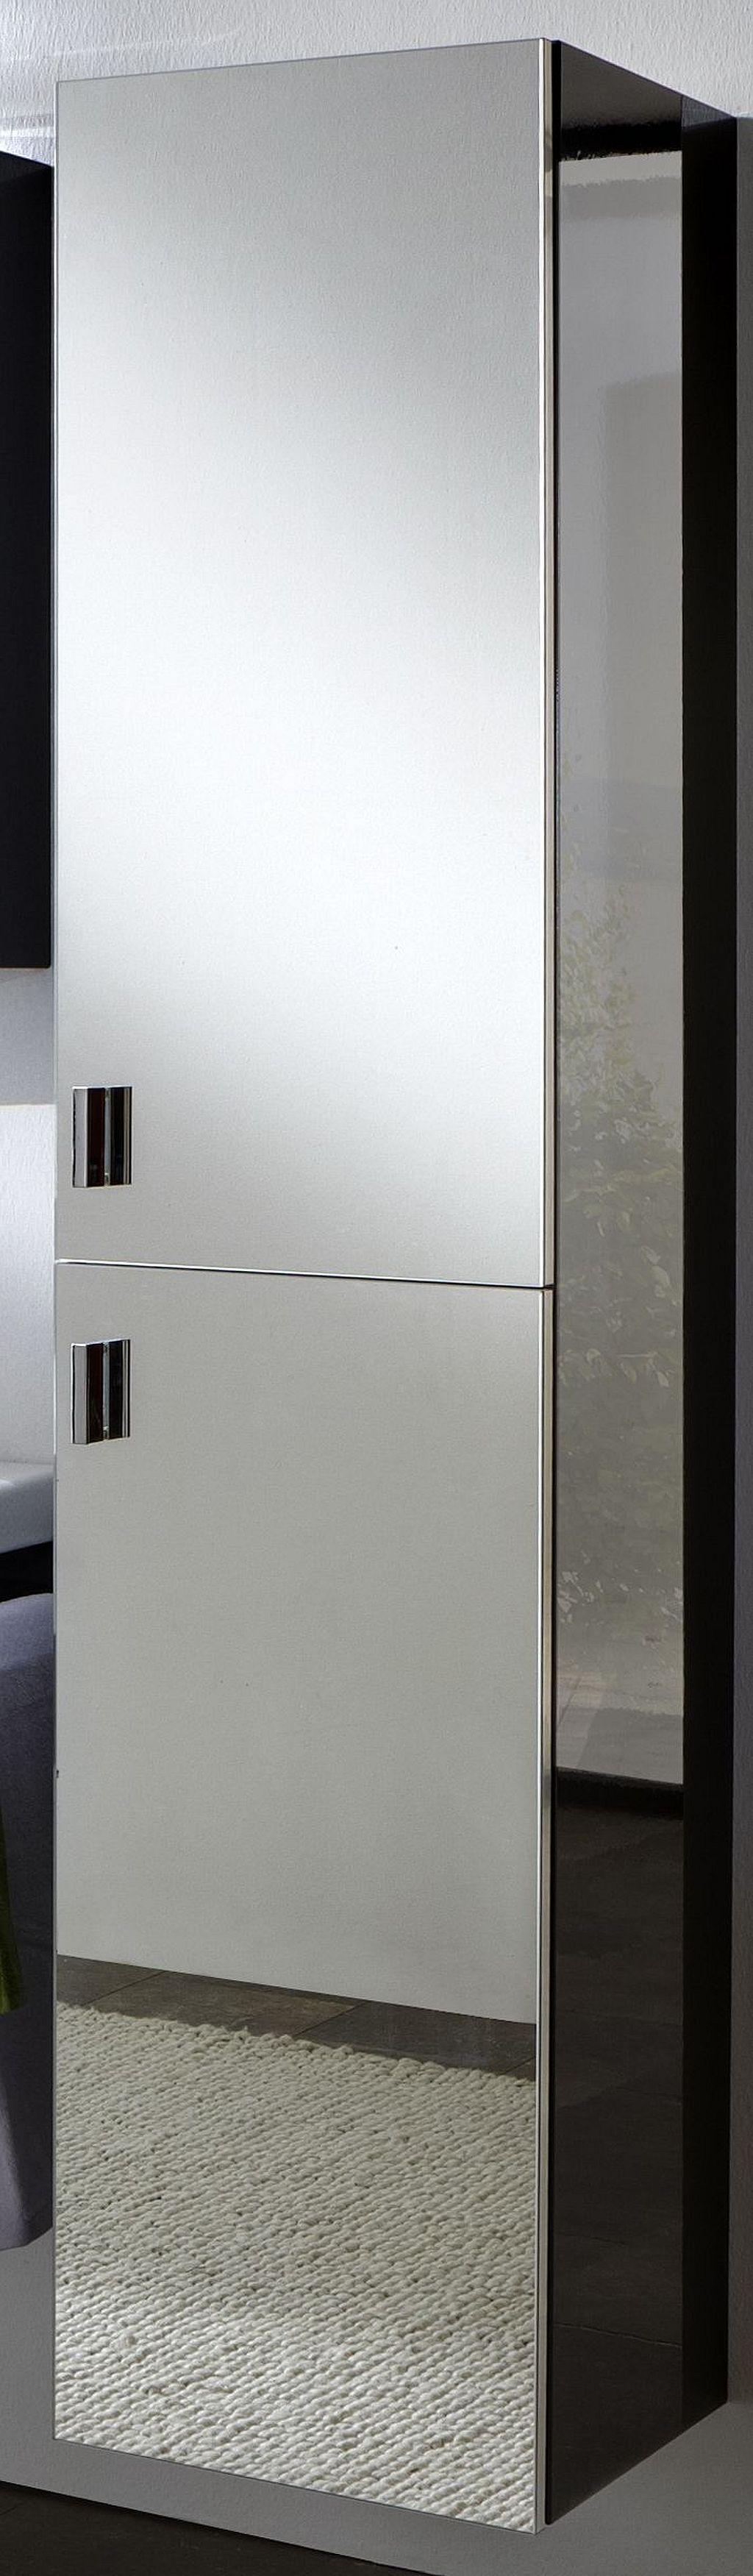 marlin bad 3160 motion hochschrank 40 cm mnhst400d mit. Black Bedroom Furniture Sets. Home Design Ideas